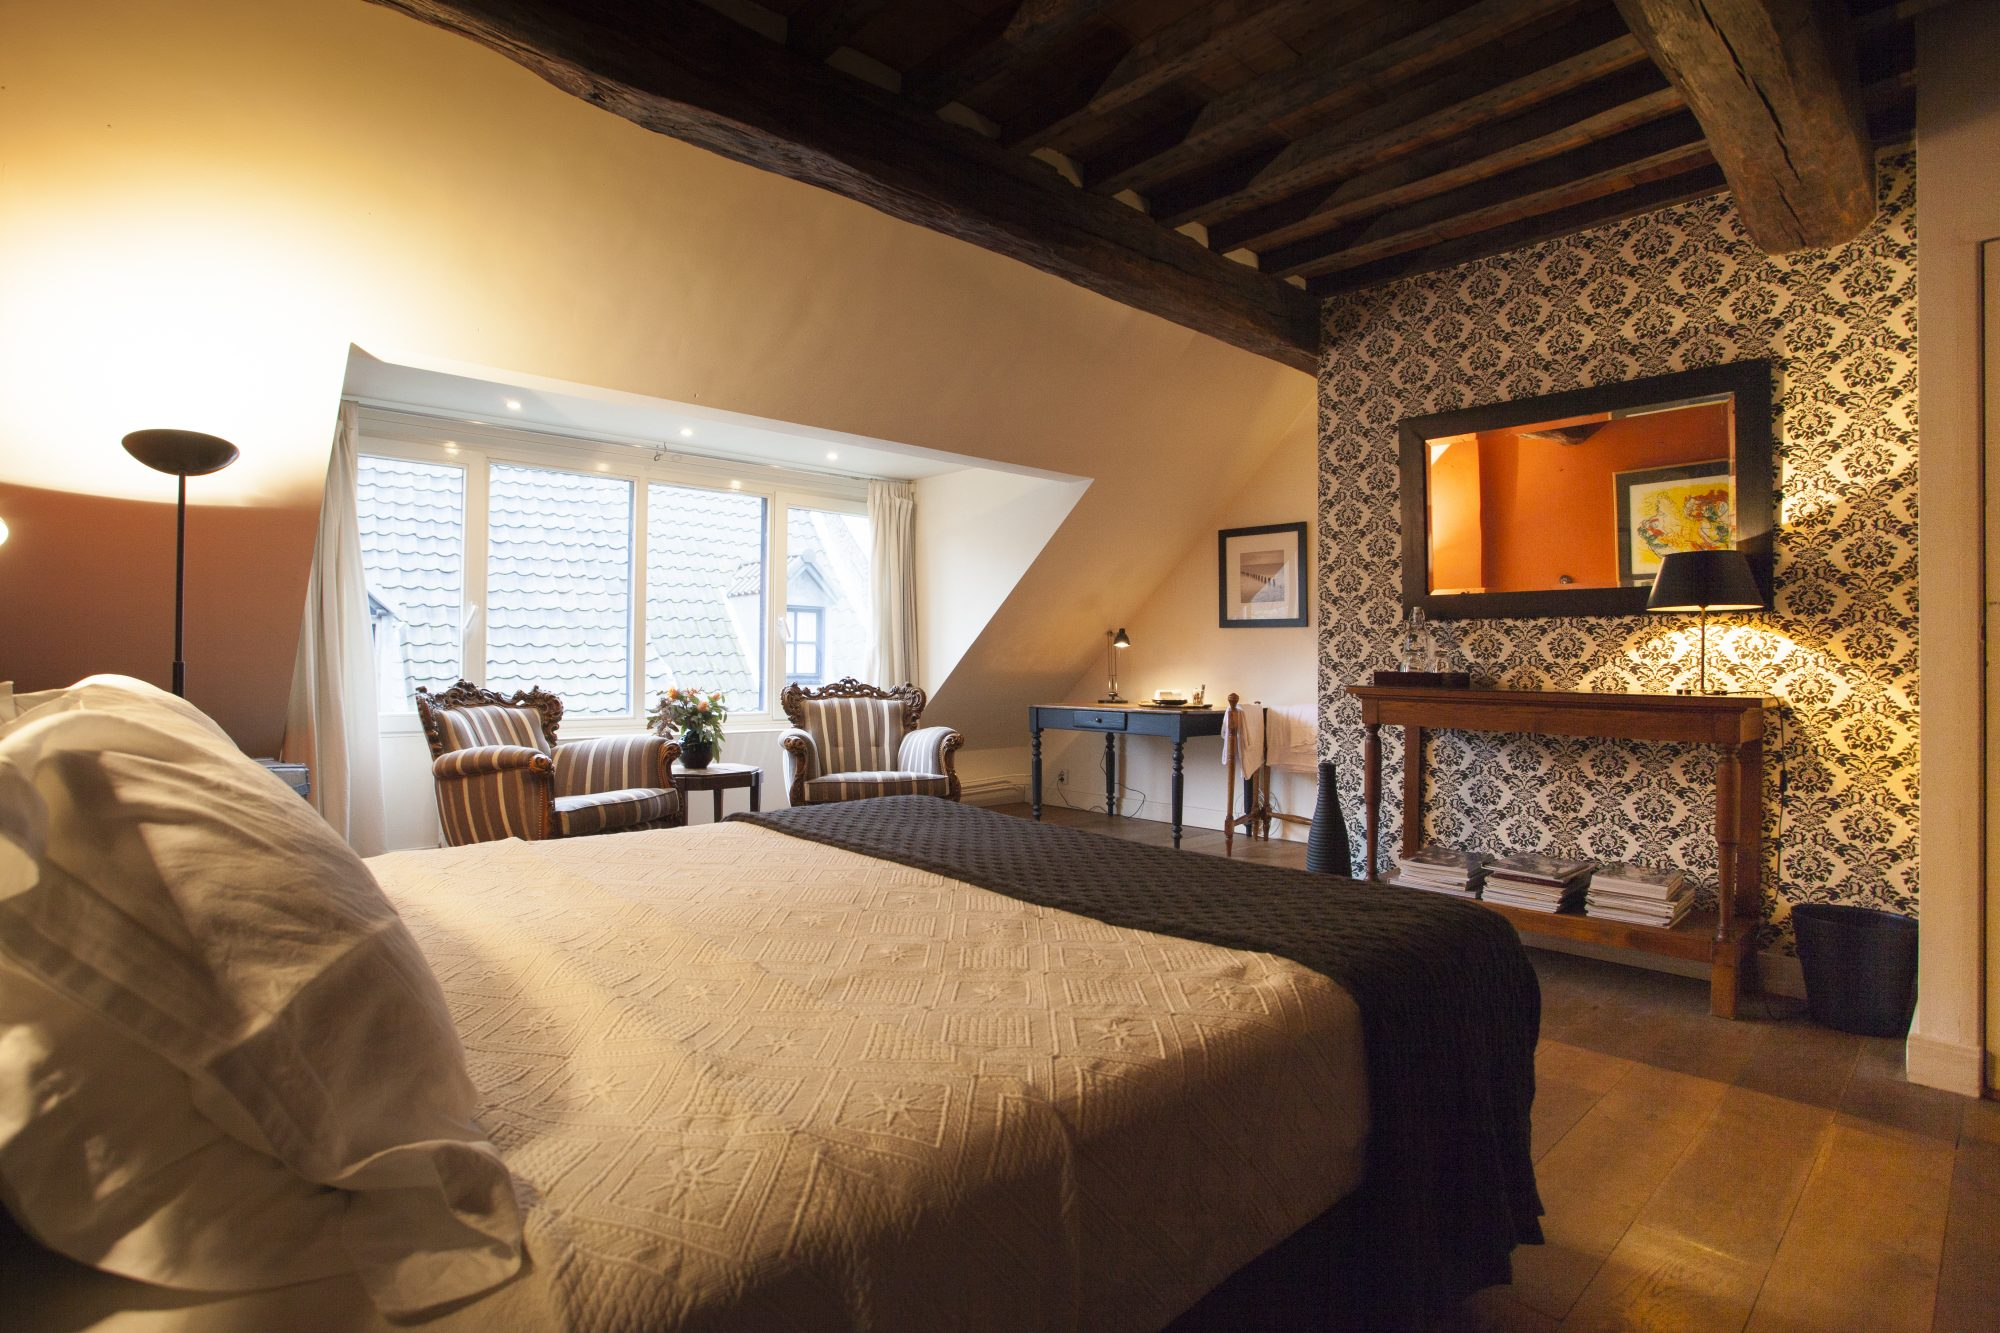 maastricht, bed and breakfast, B&B, hotel, boutiquehotel, bonnefantenmuseum, vrijthof, MECC